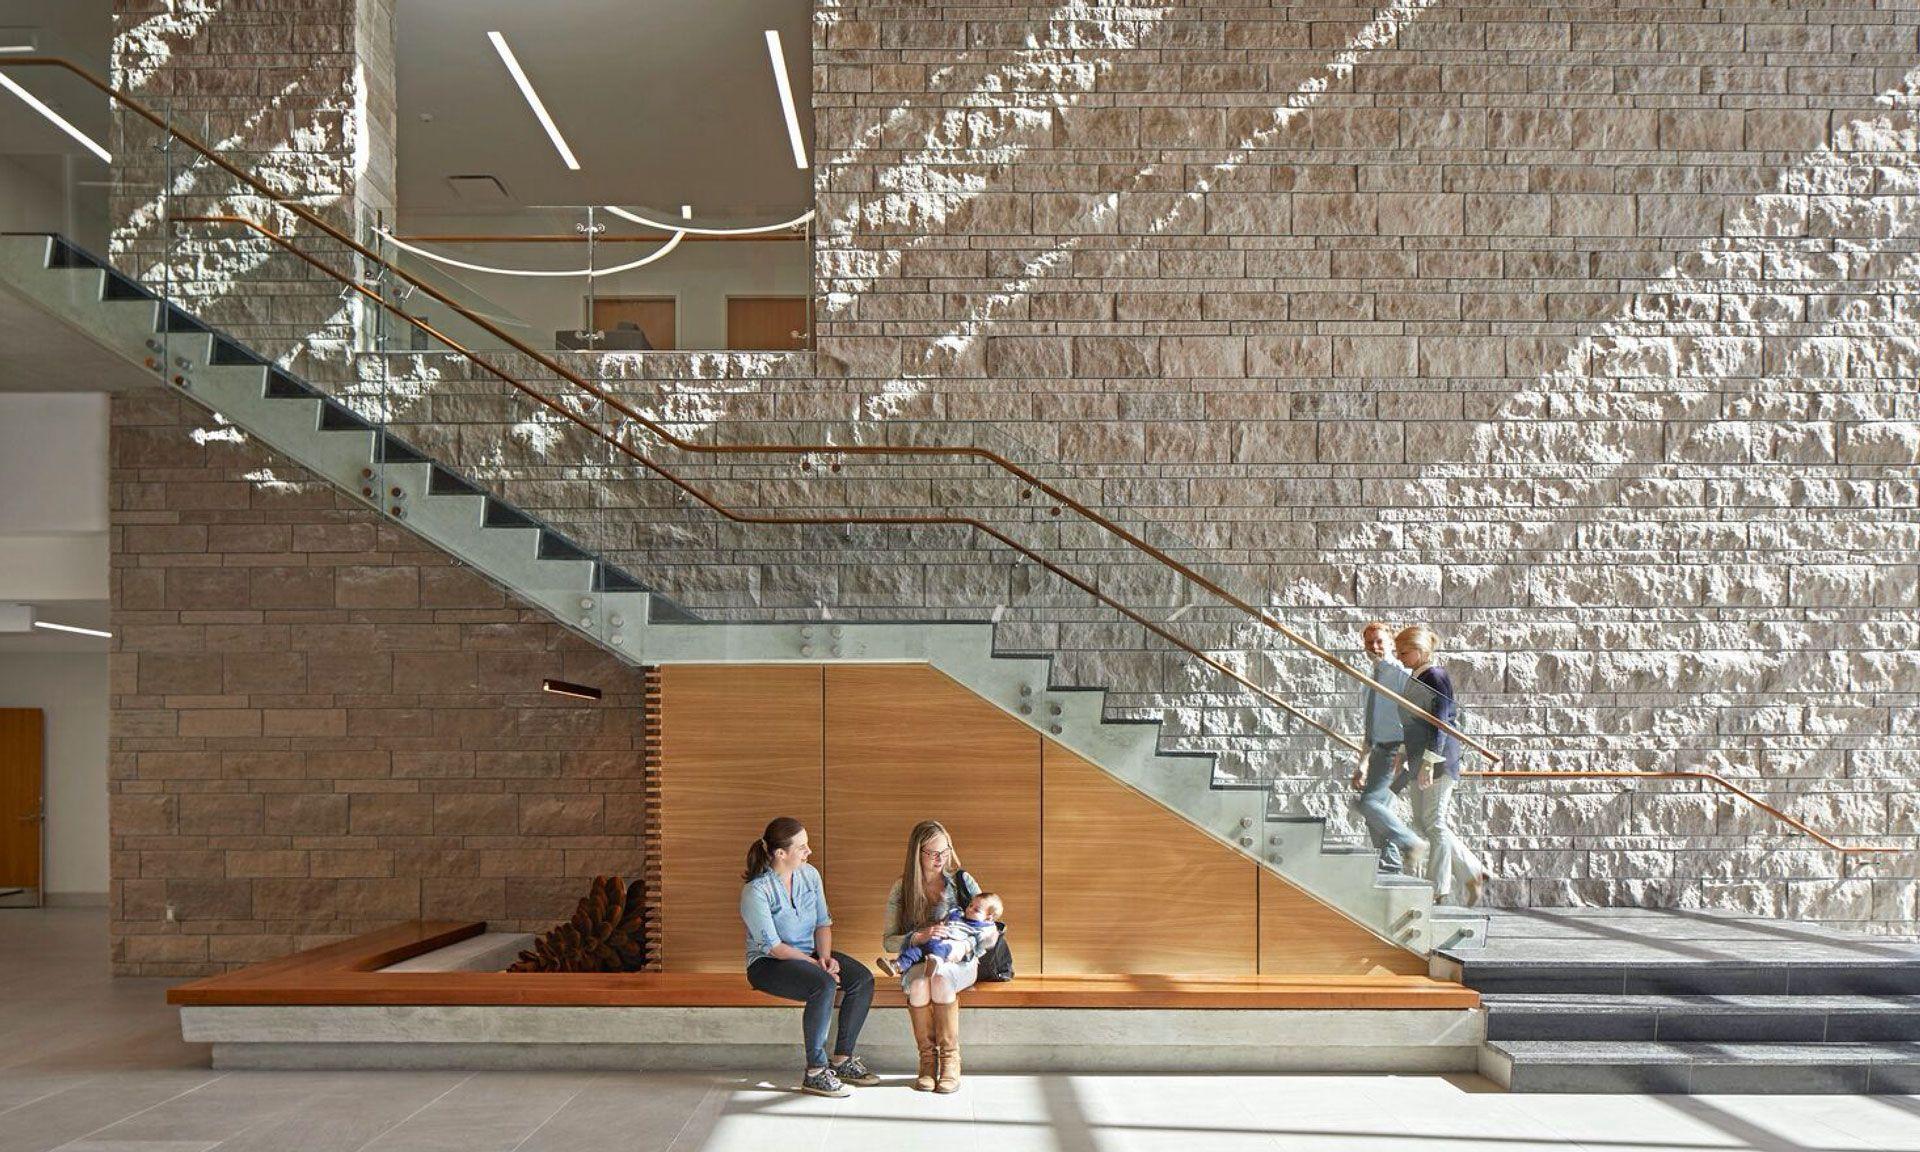 This AwardWinning Design Transforms the Way You See